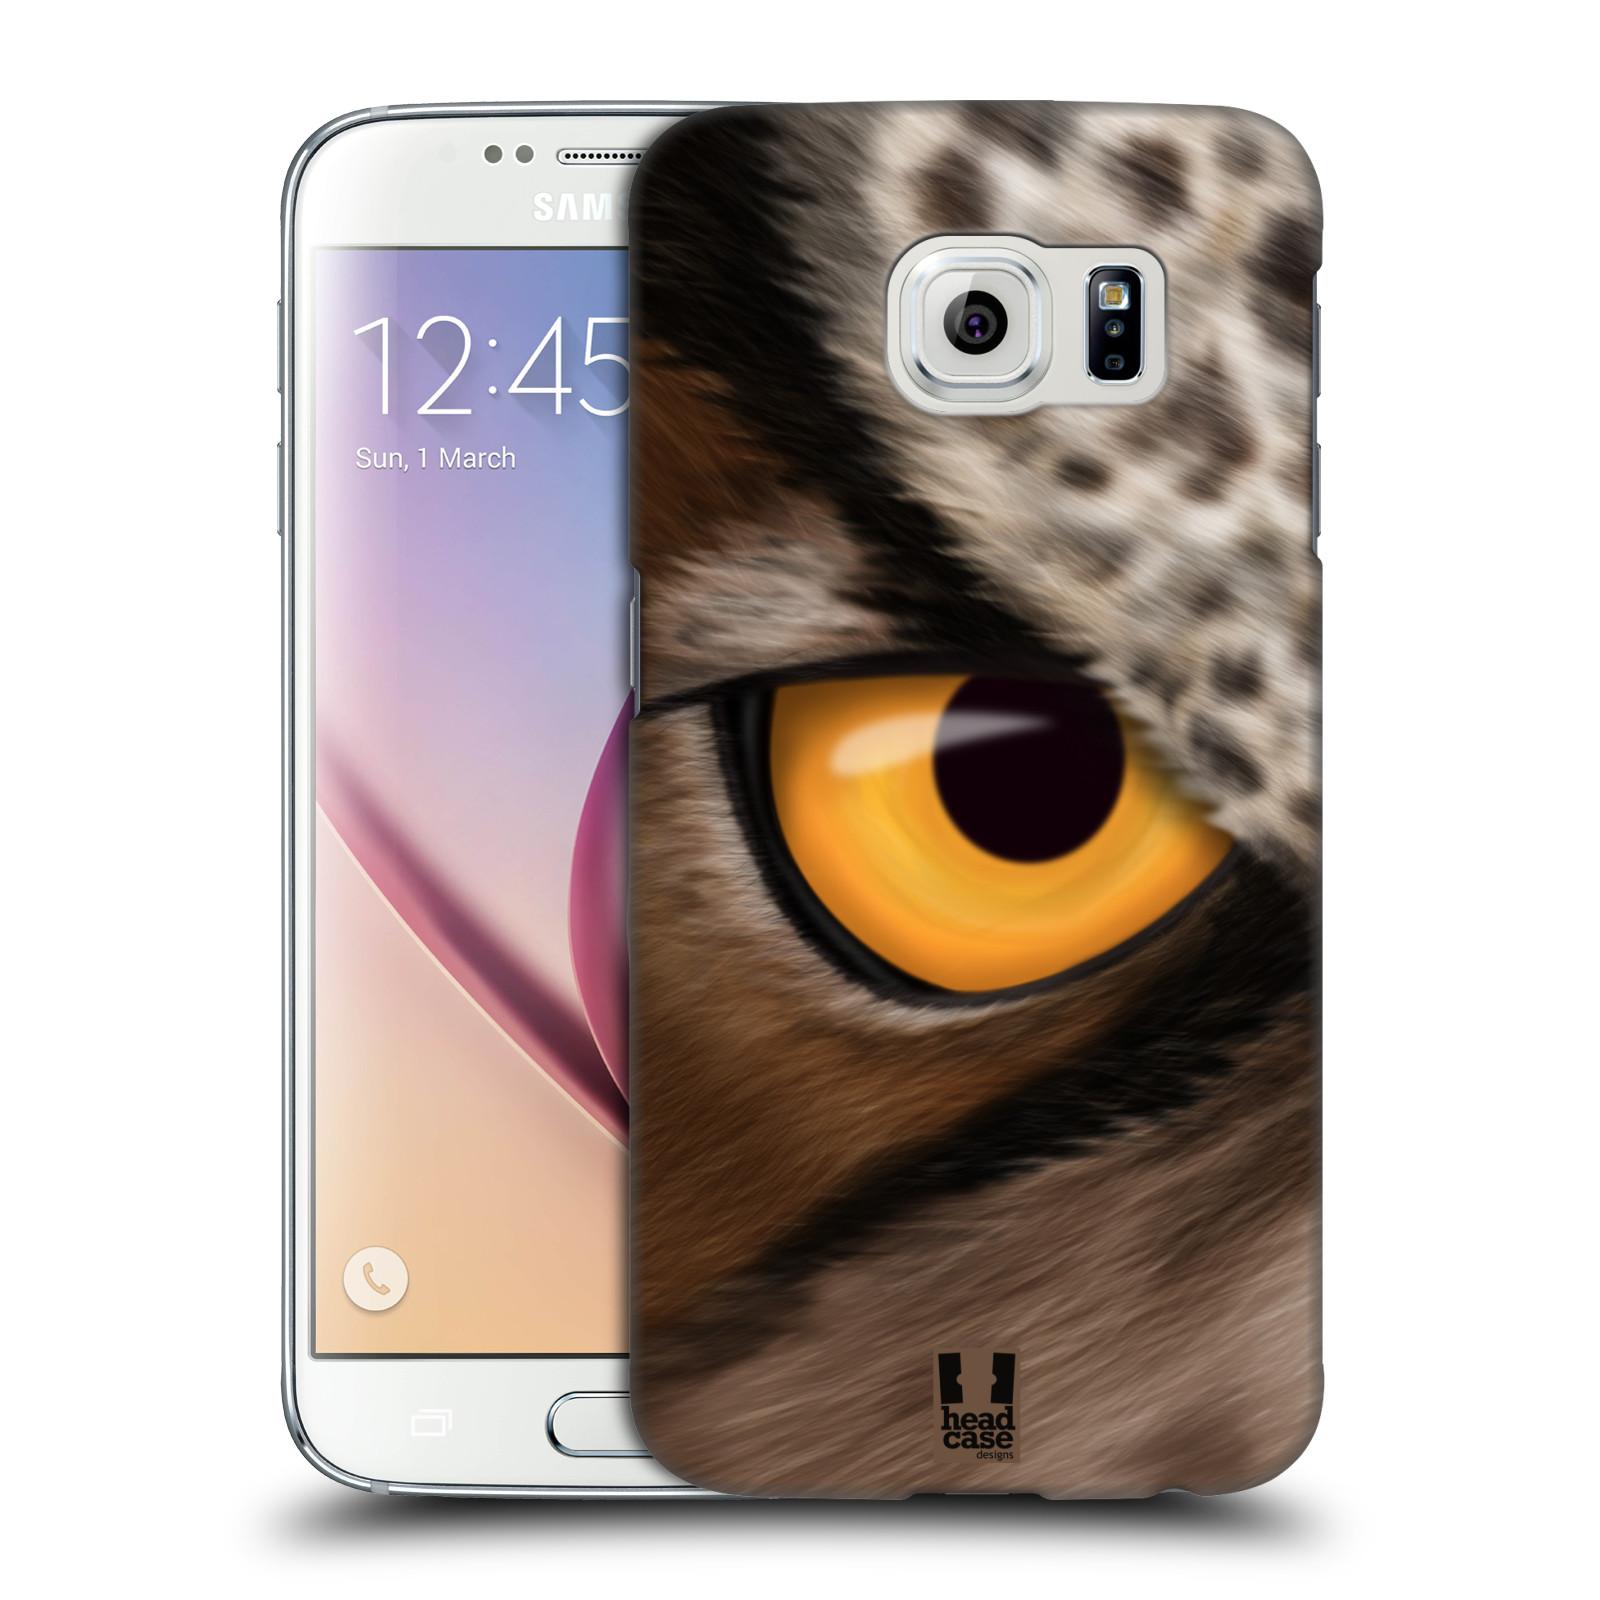 HEAD CASE plastový obal na mobil SAMSUNG Galaxy S6 (G9200, G920F) vzor pohled zvířete oko sova